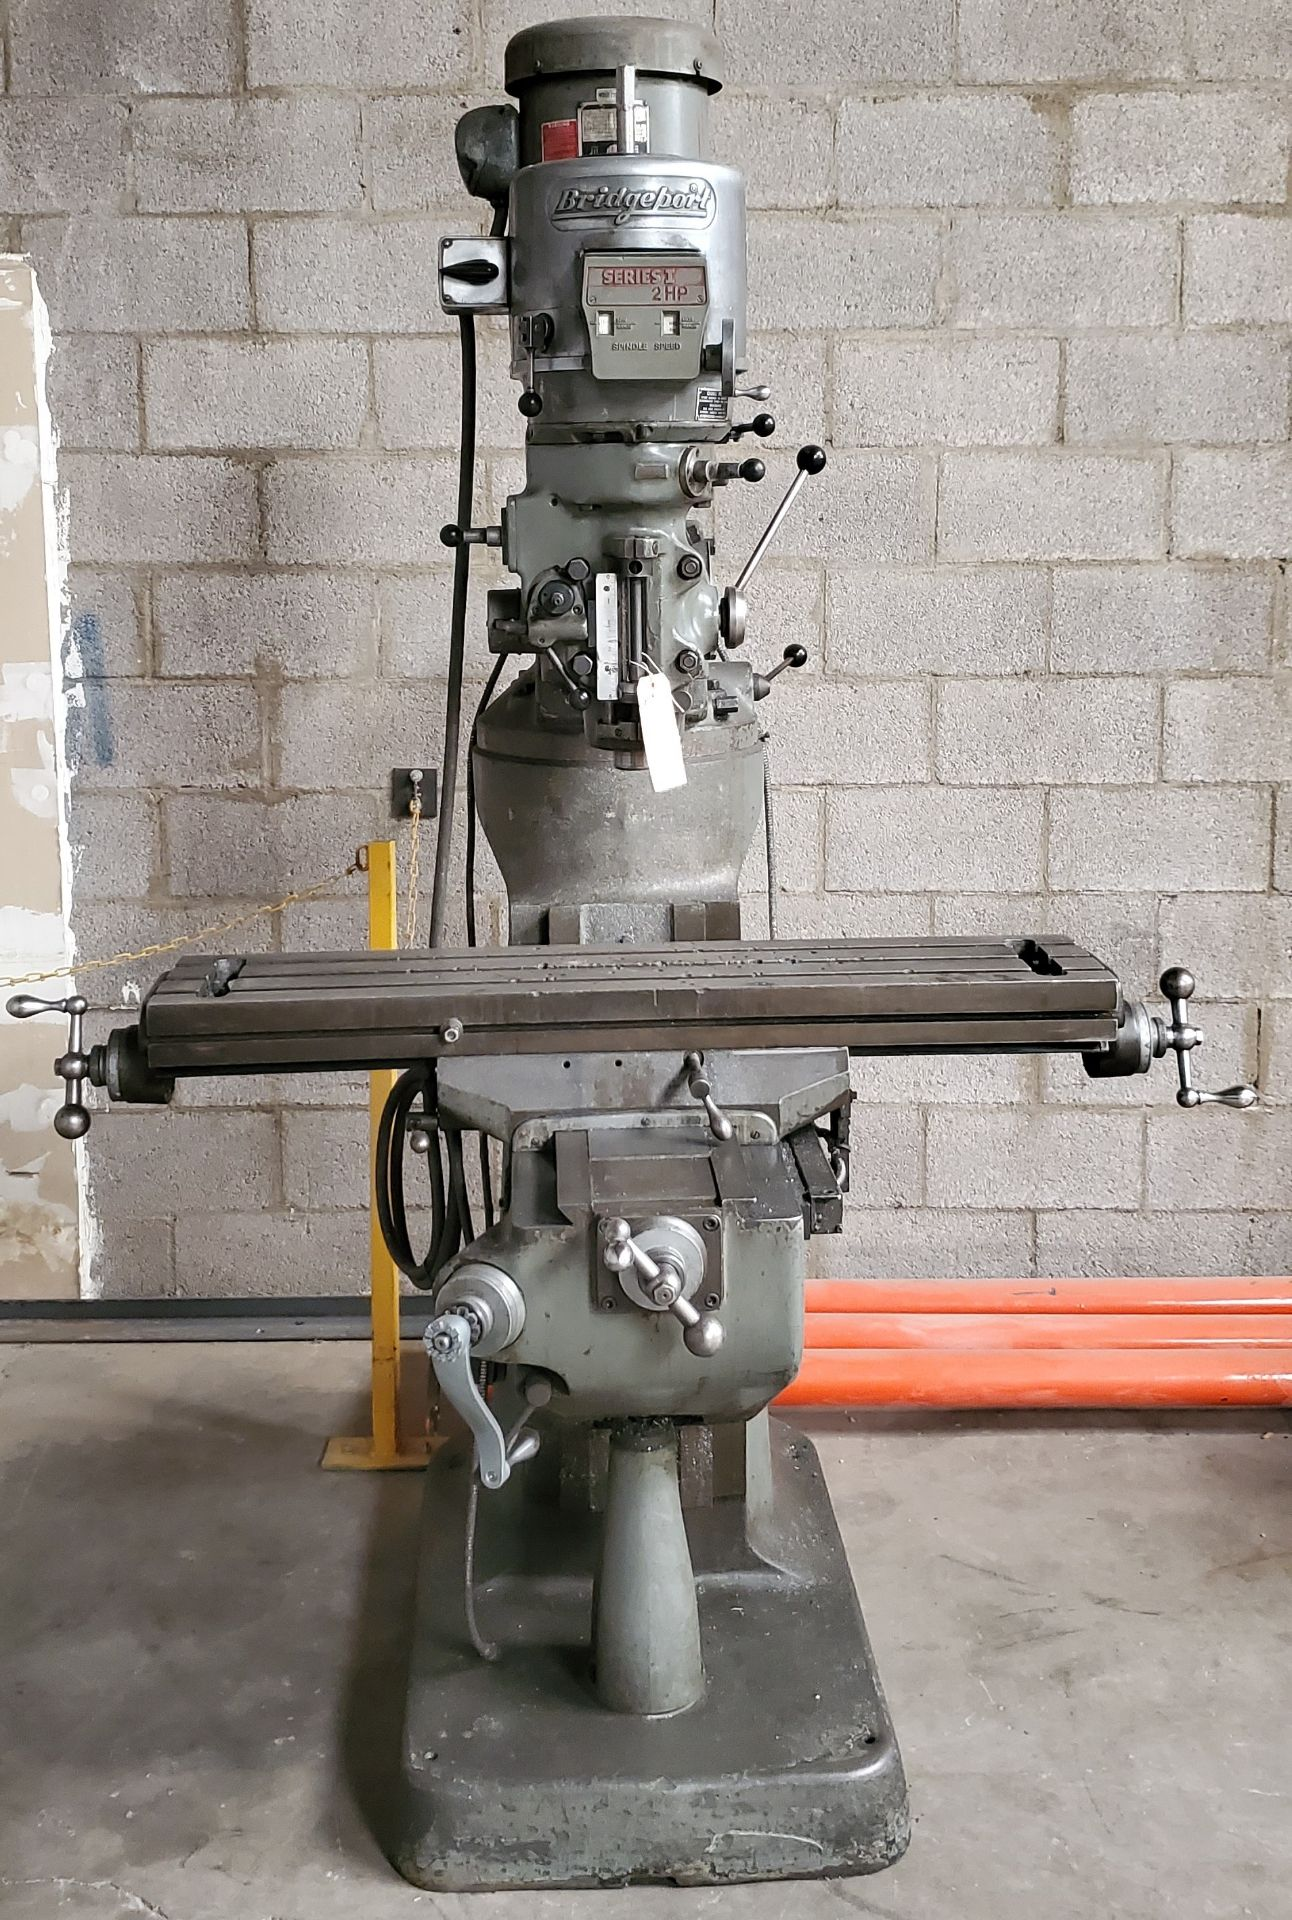 Lot 1 - Bridgeport Series 2 Vertical Milling Machine, 2 Hp 230 Volts 3 phase Motor